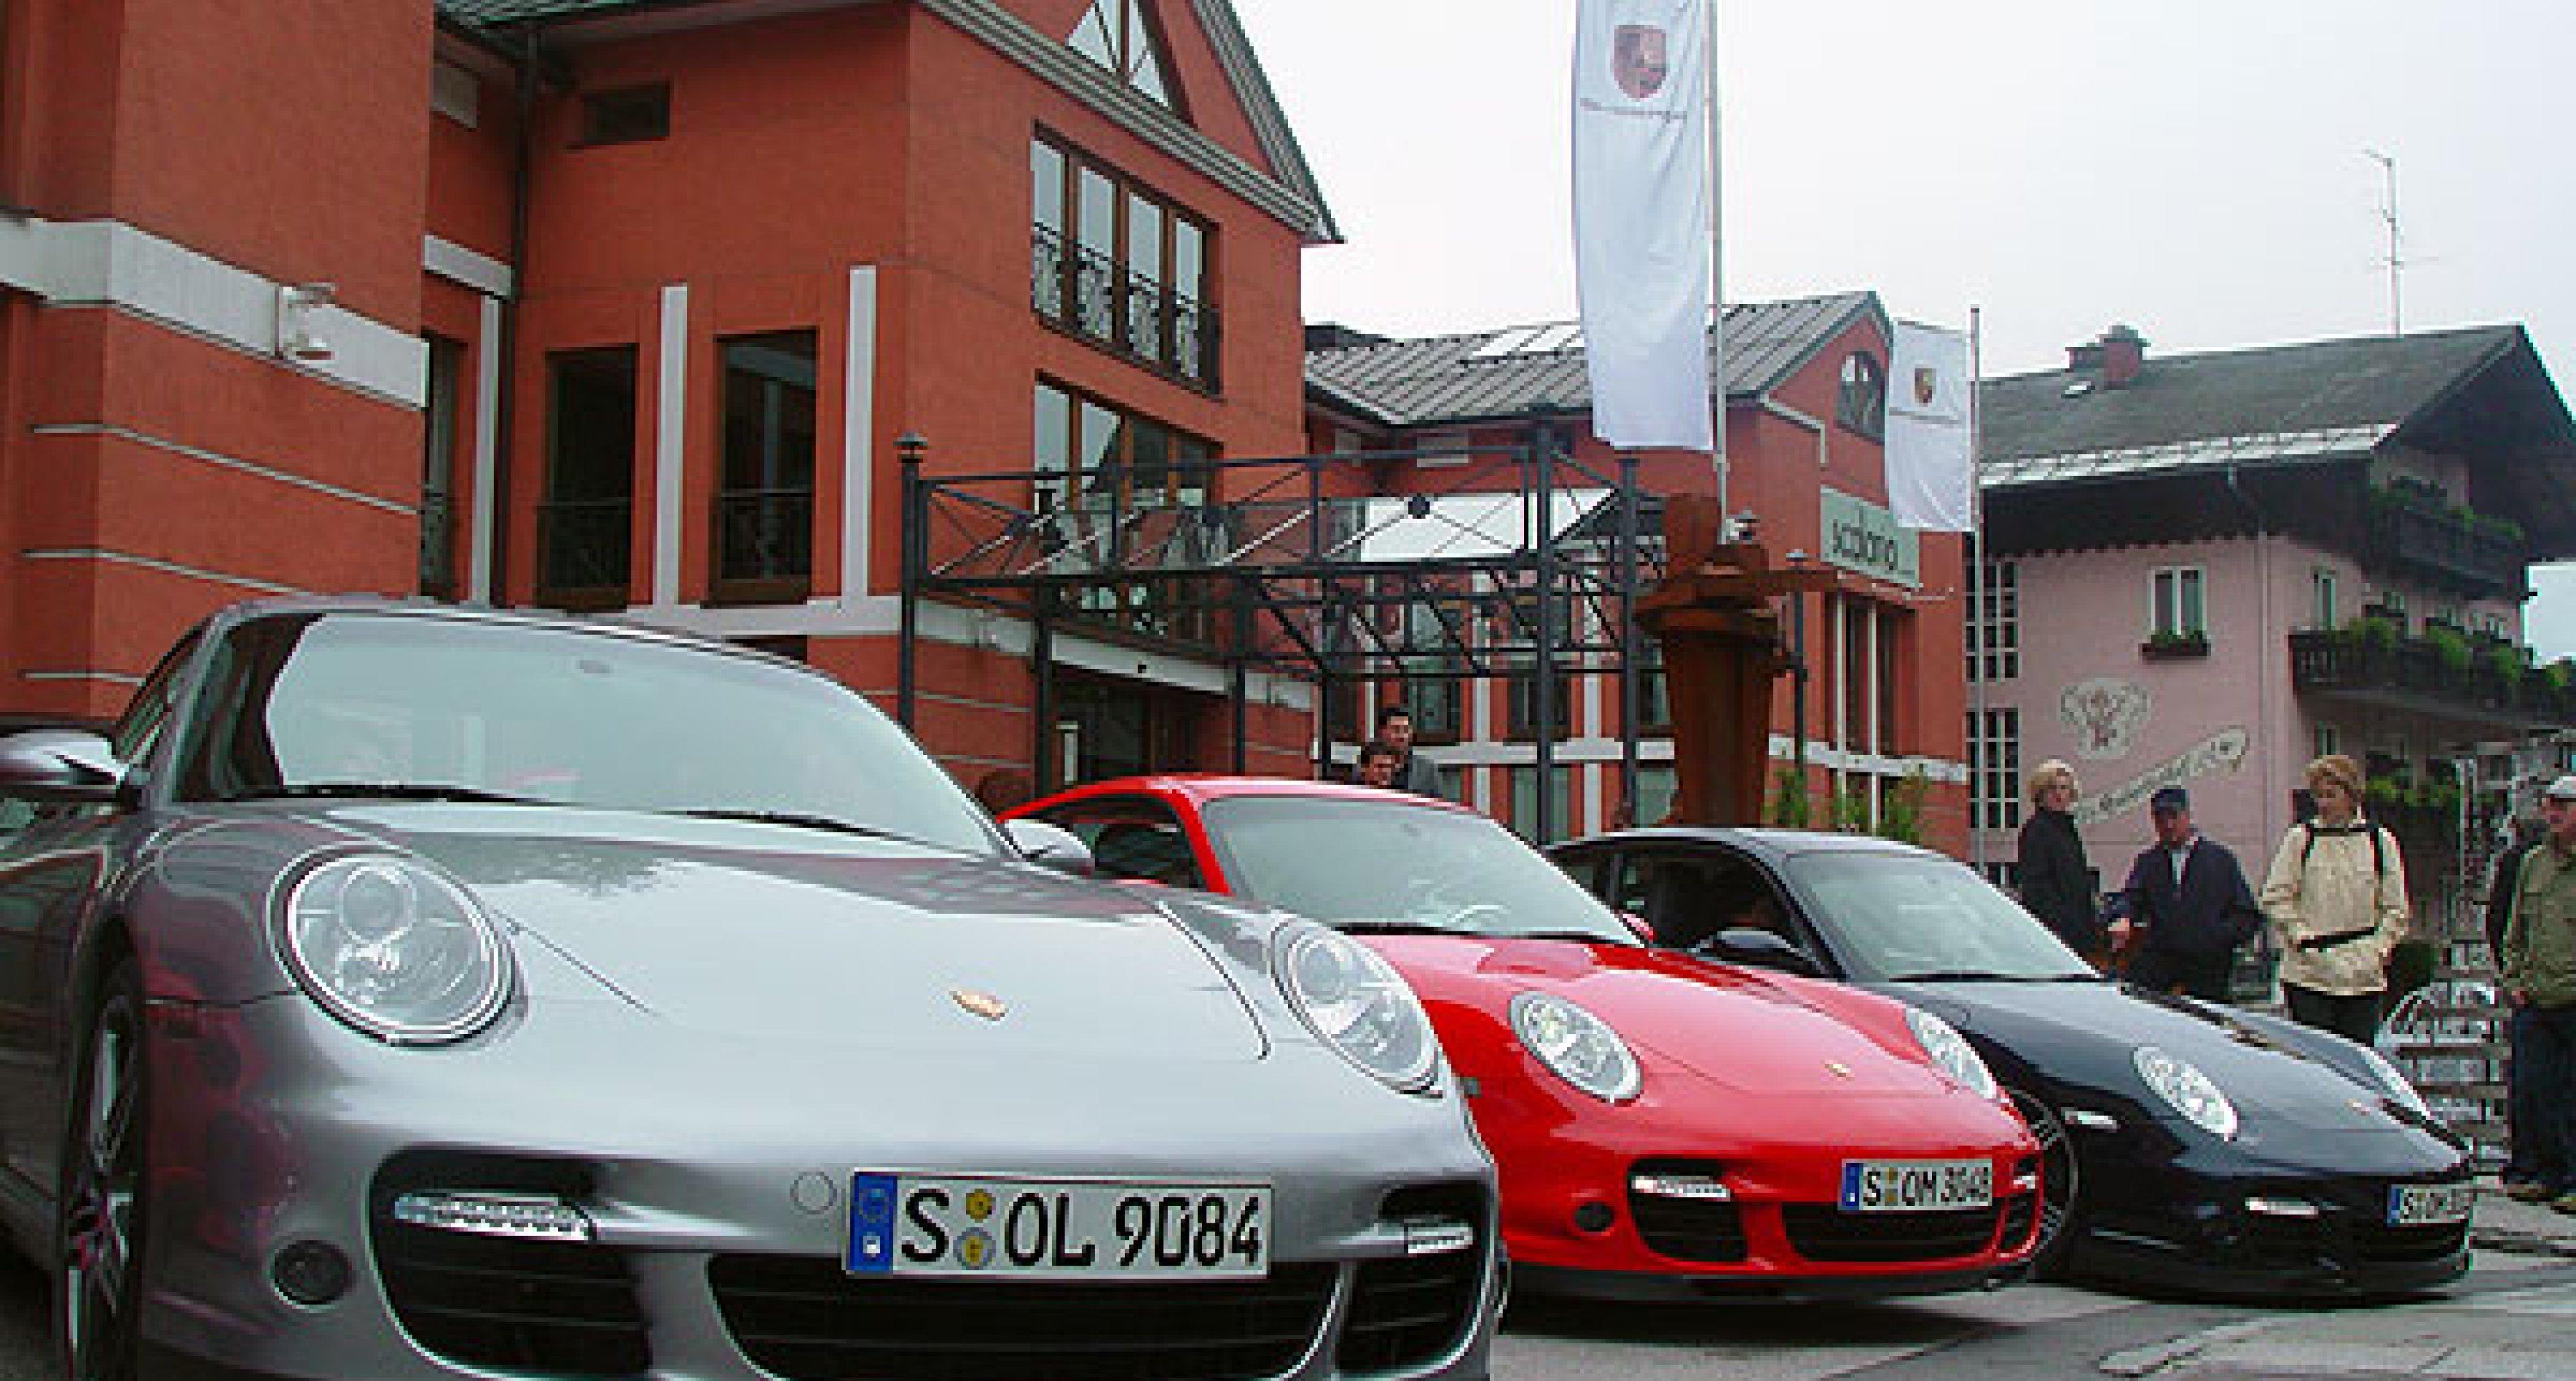 Das Porsche-Meeting der besonderen Art